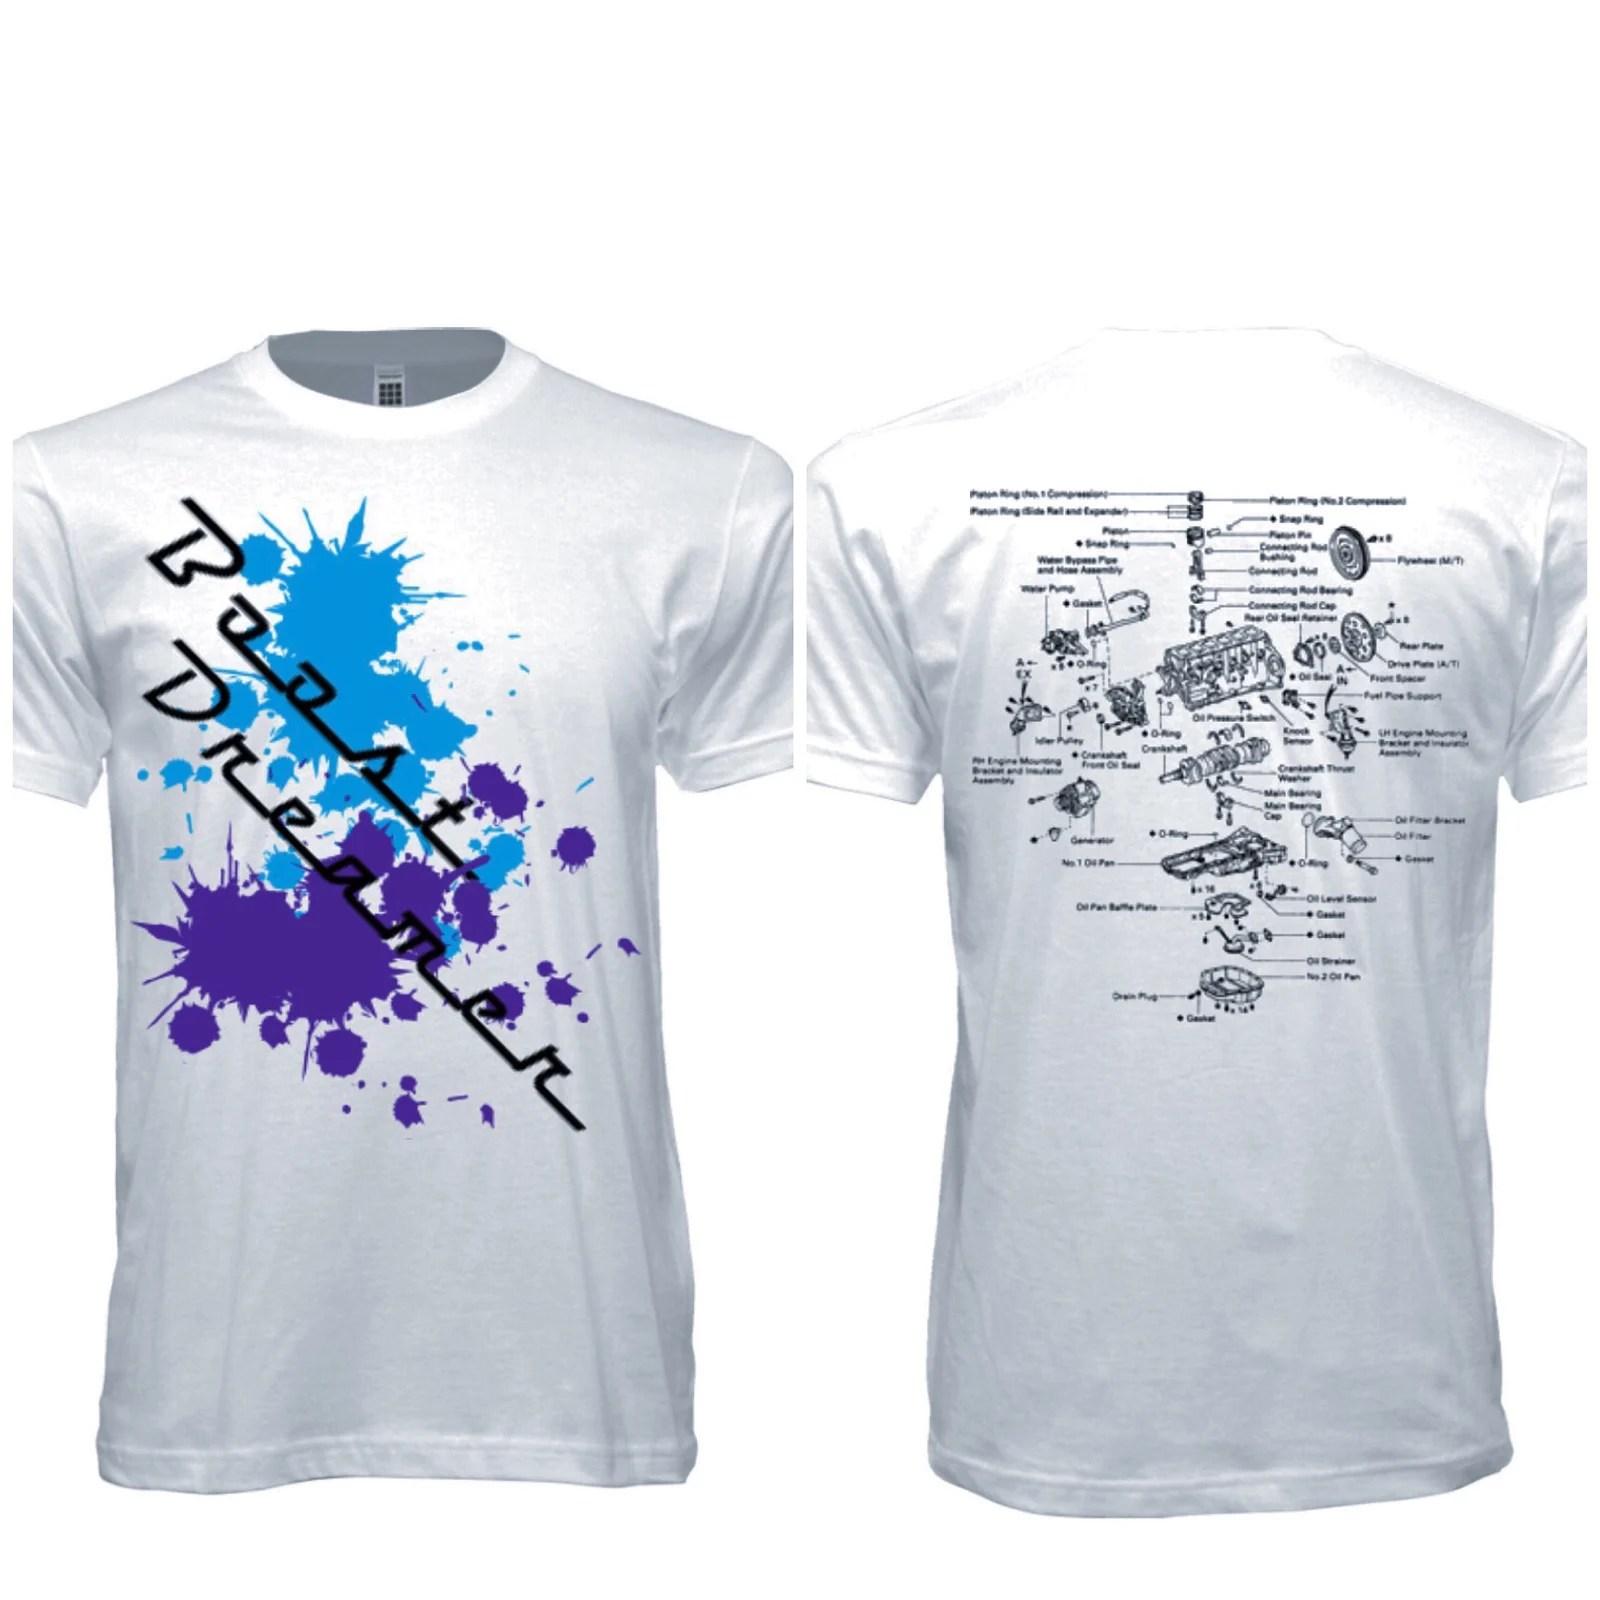 medium resolution of image of boost dreamer 2jz diagram t shirt